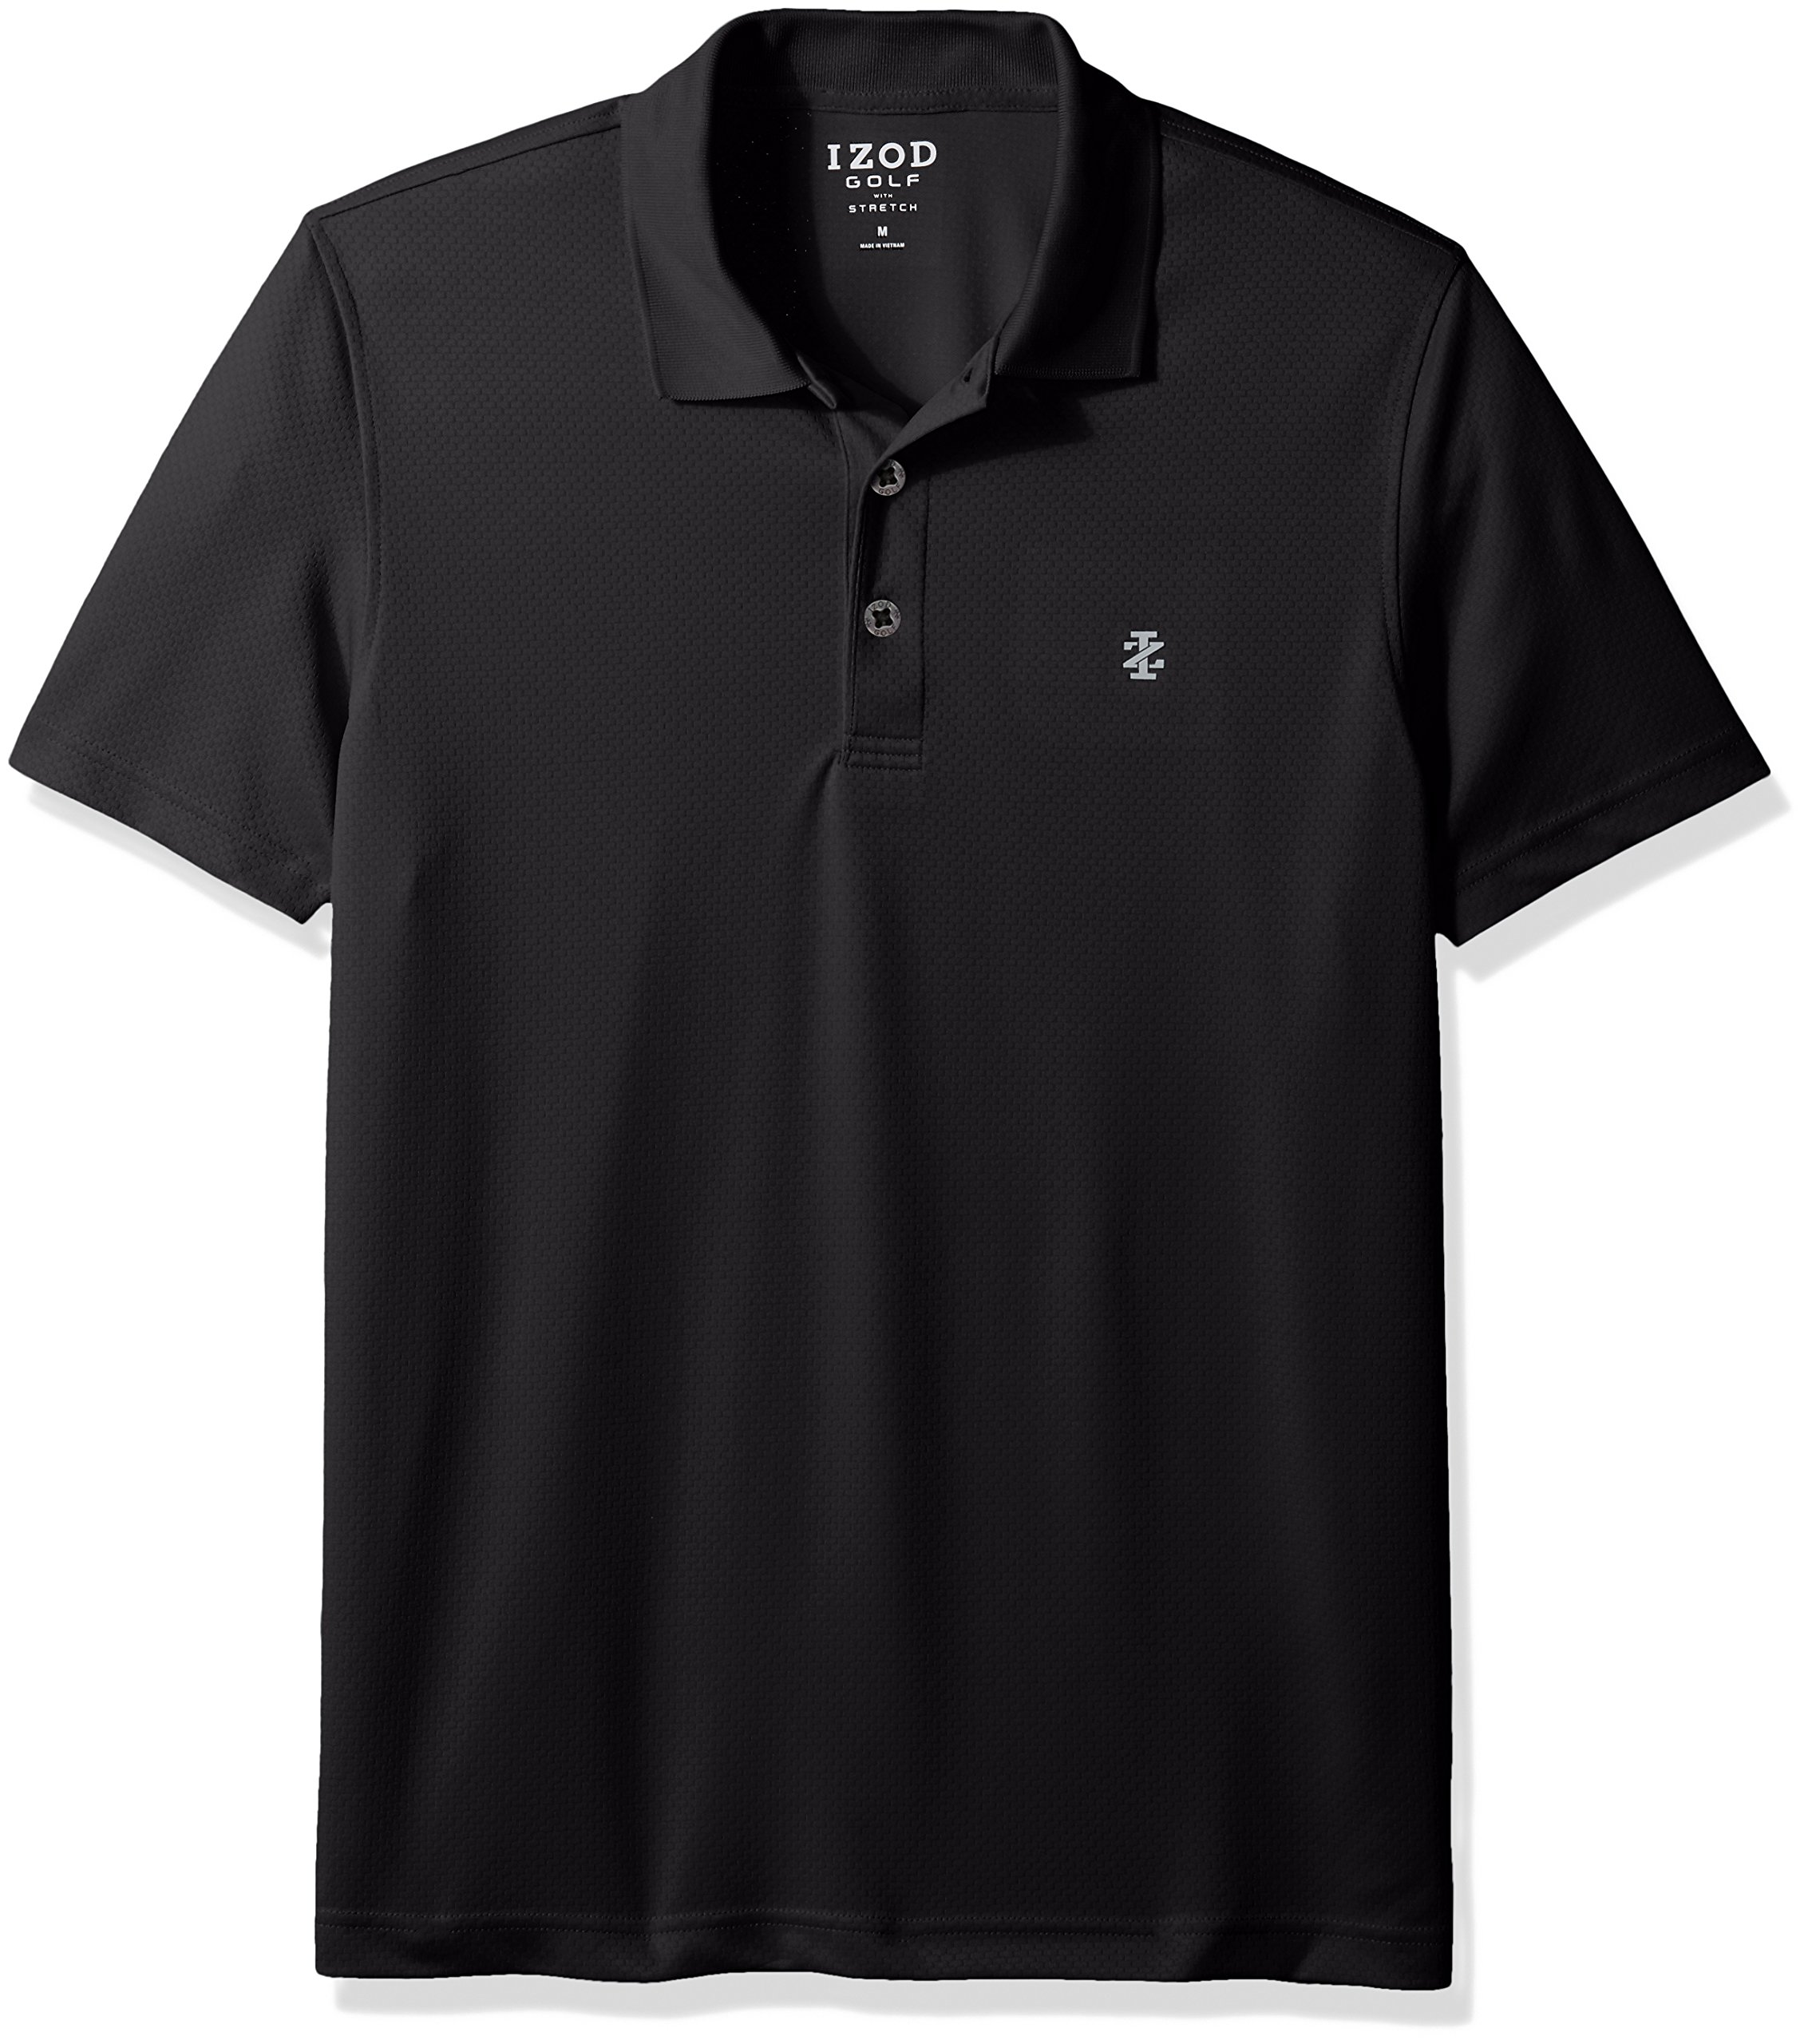 IZOD Men's Golf Title Holder Short Sleeve Polo, Black, M